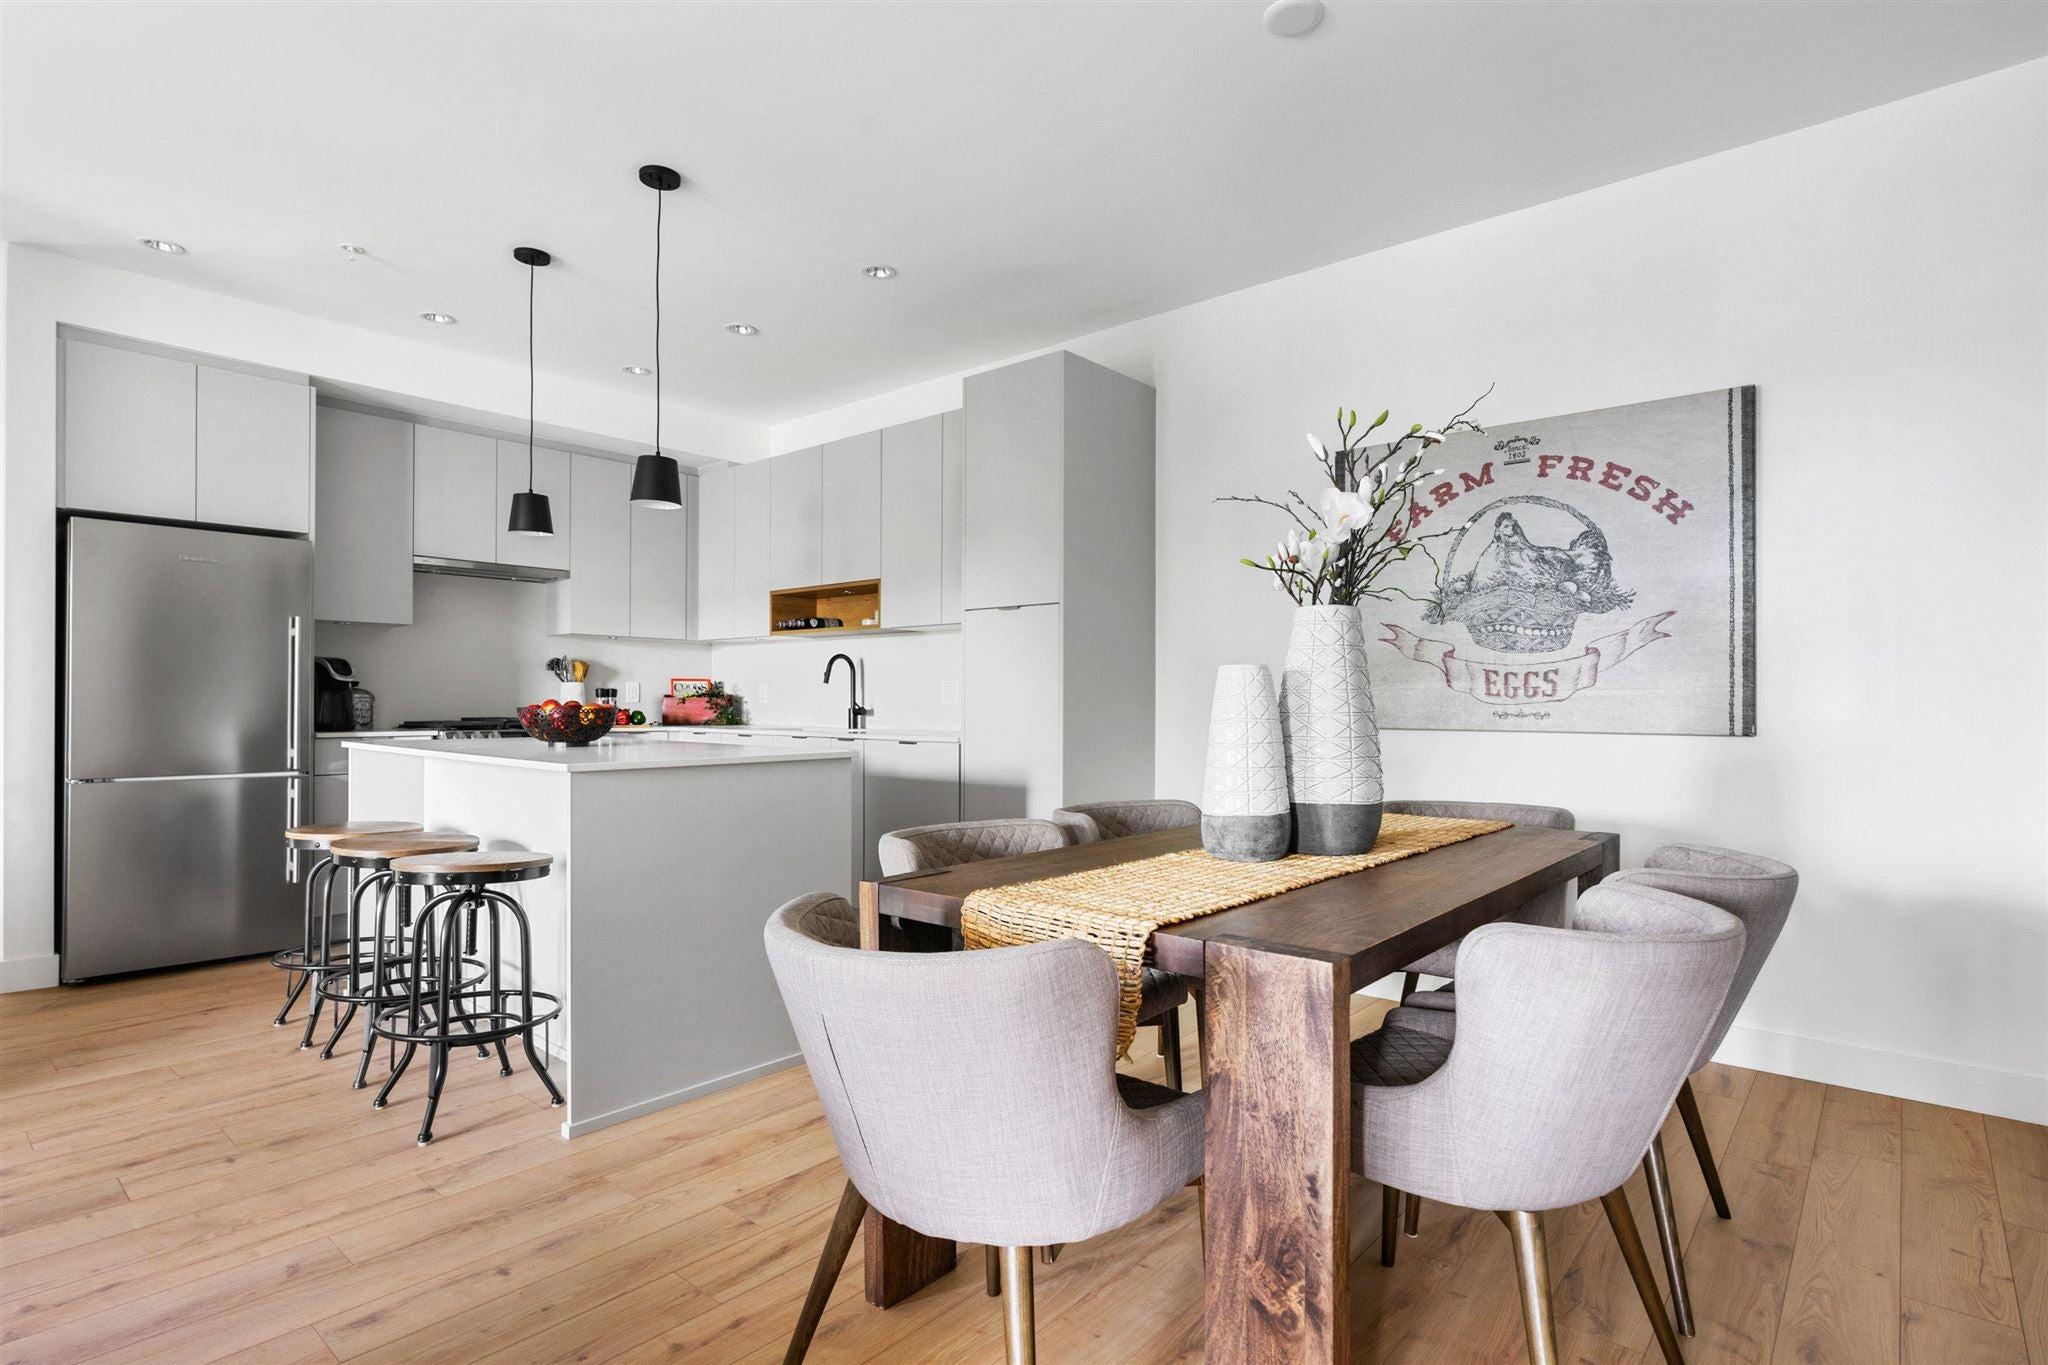 328 2493 MONTROSE AVENUE - Central Abbotsford Apartment/Condo for sale, 3 Bedrooms (R2600182) - #1